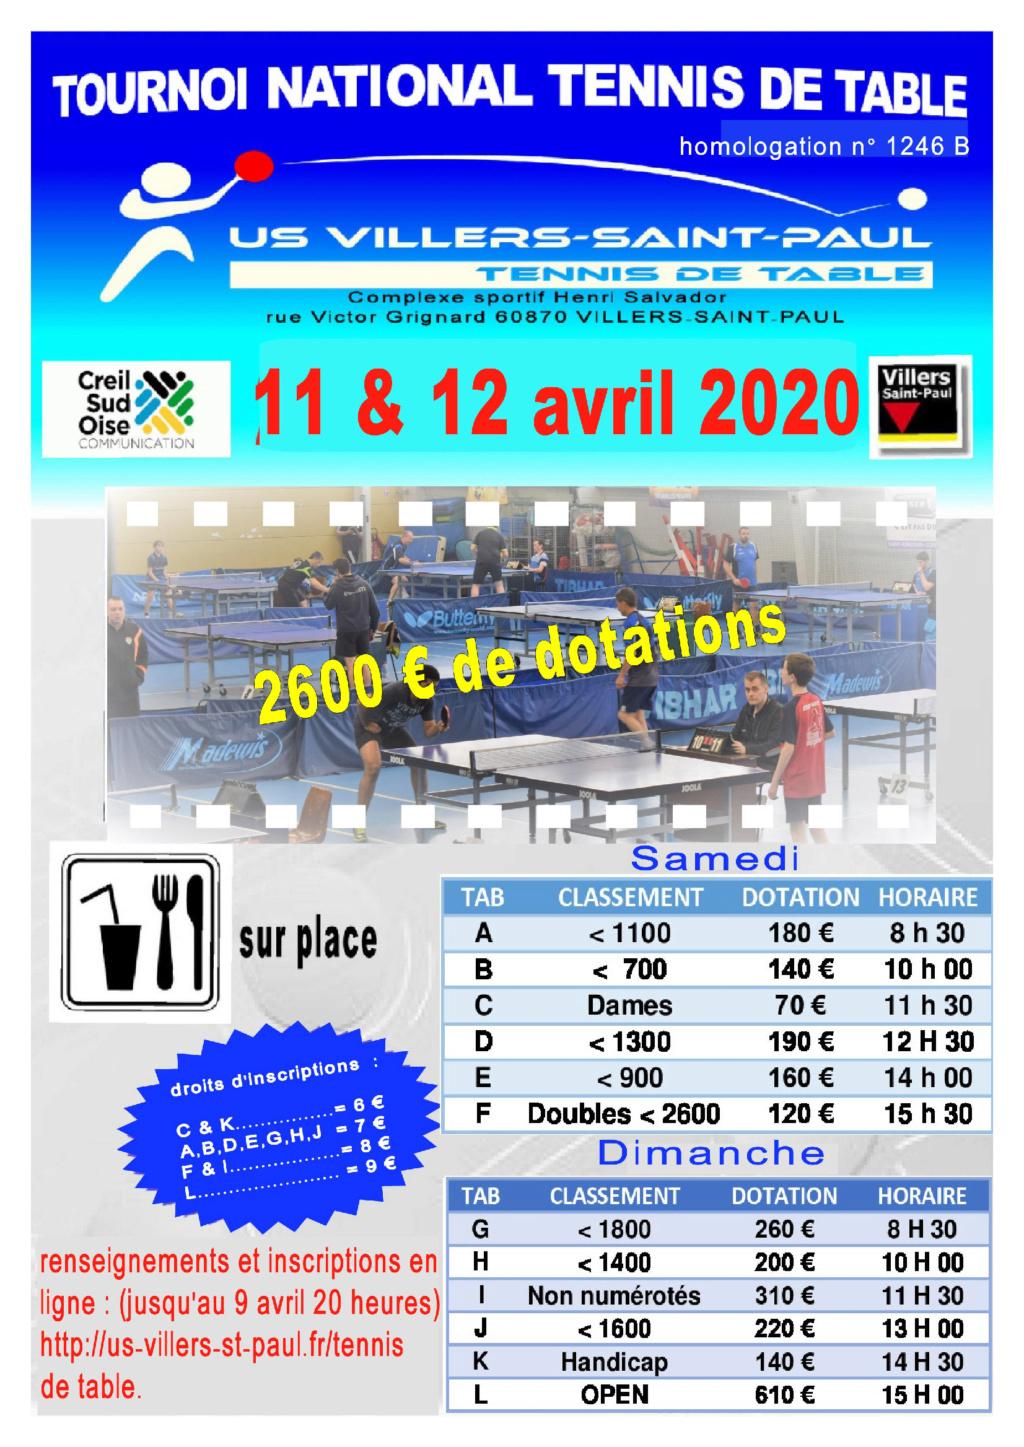 TOURNOI NATIONAL B Villers-St-Paul (oise) 11 & 12 avril 2020 Affich19